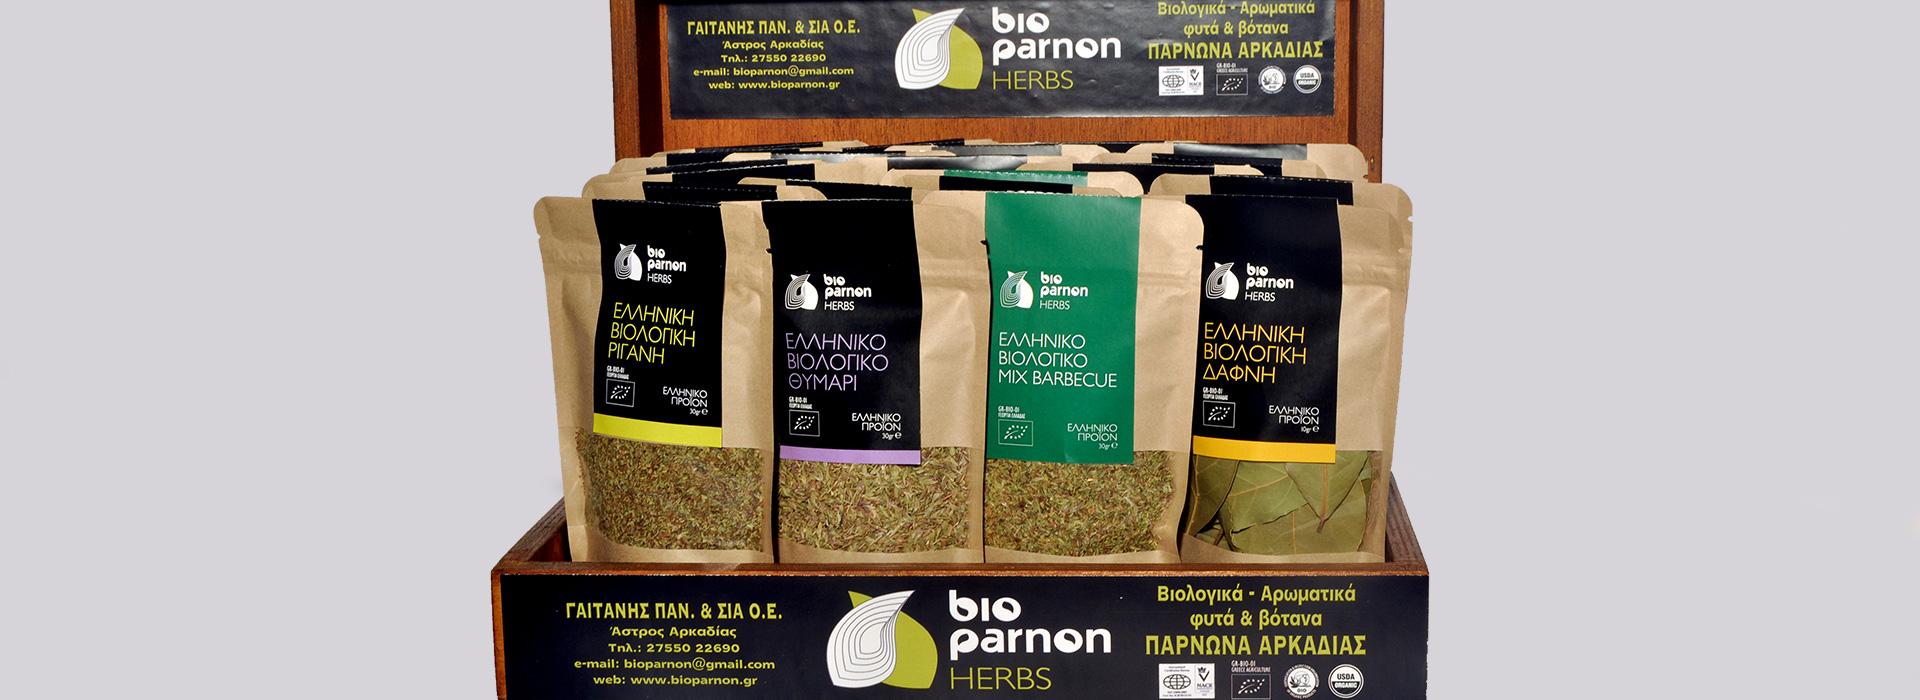 Bioparnon_Herbs_Organic_Herbs